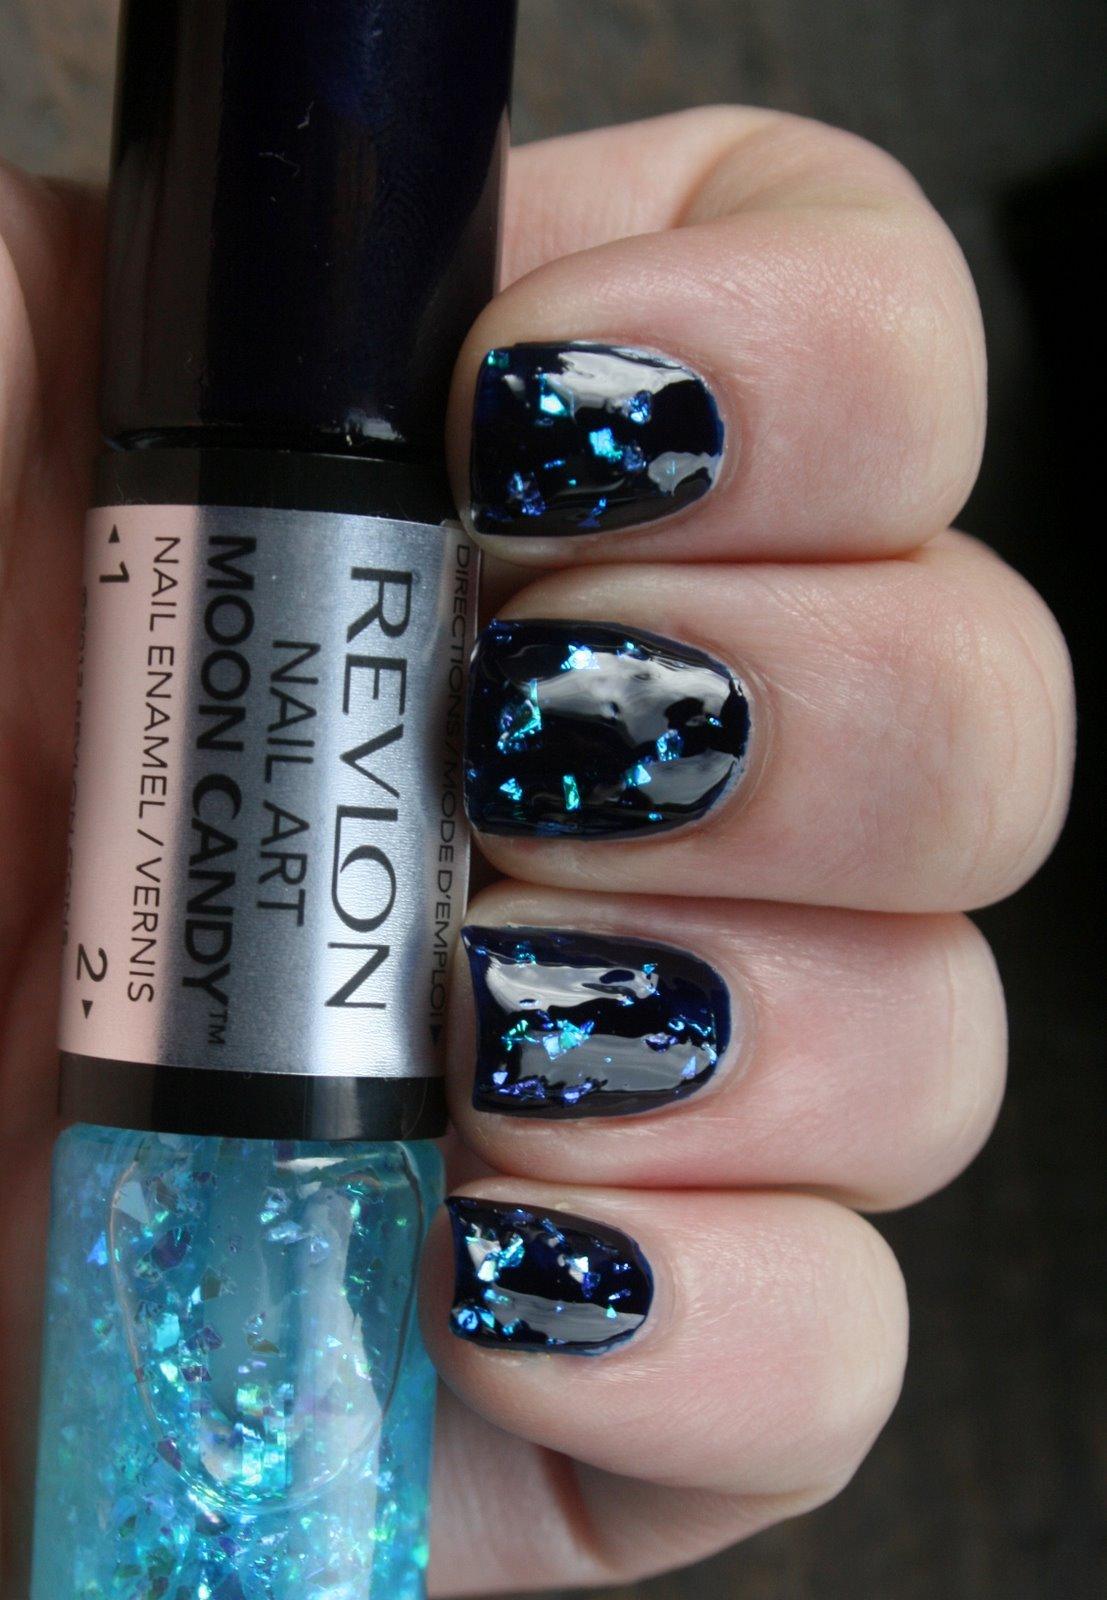 Revlon Moon Candy - Galactic